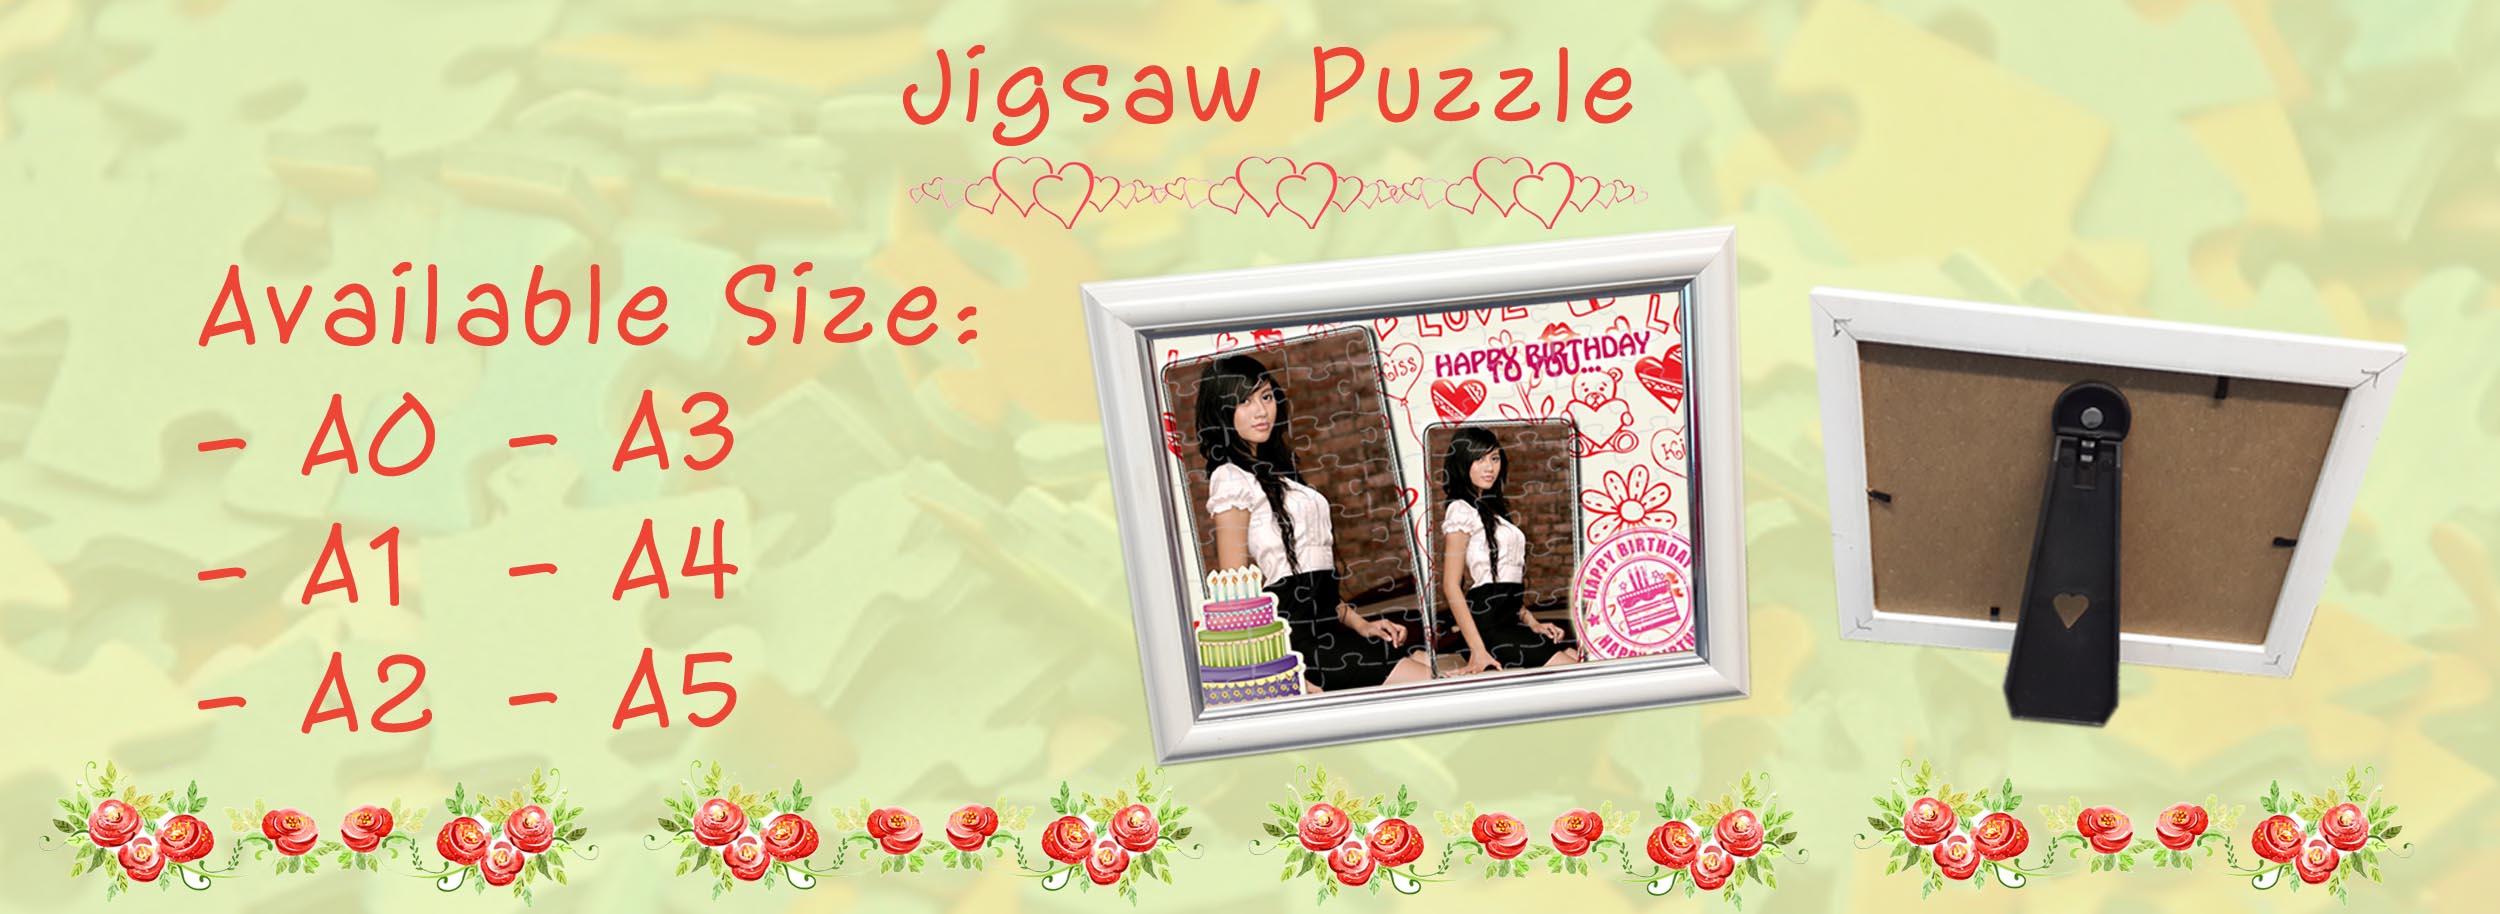 puzzle-banner.jpg